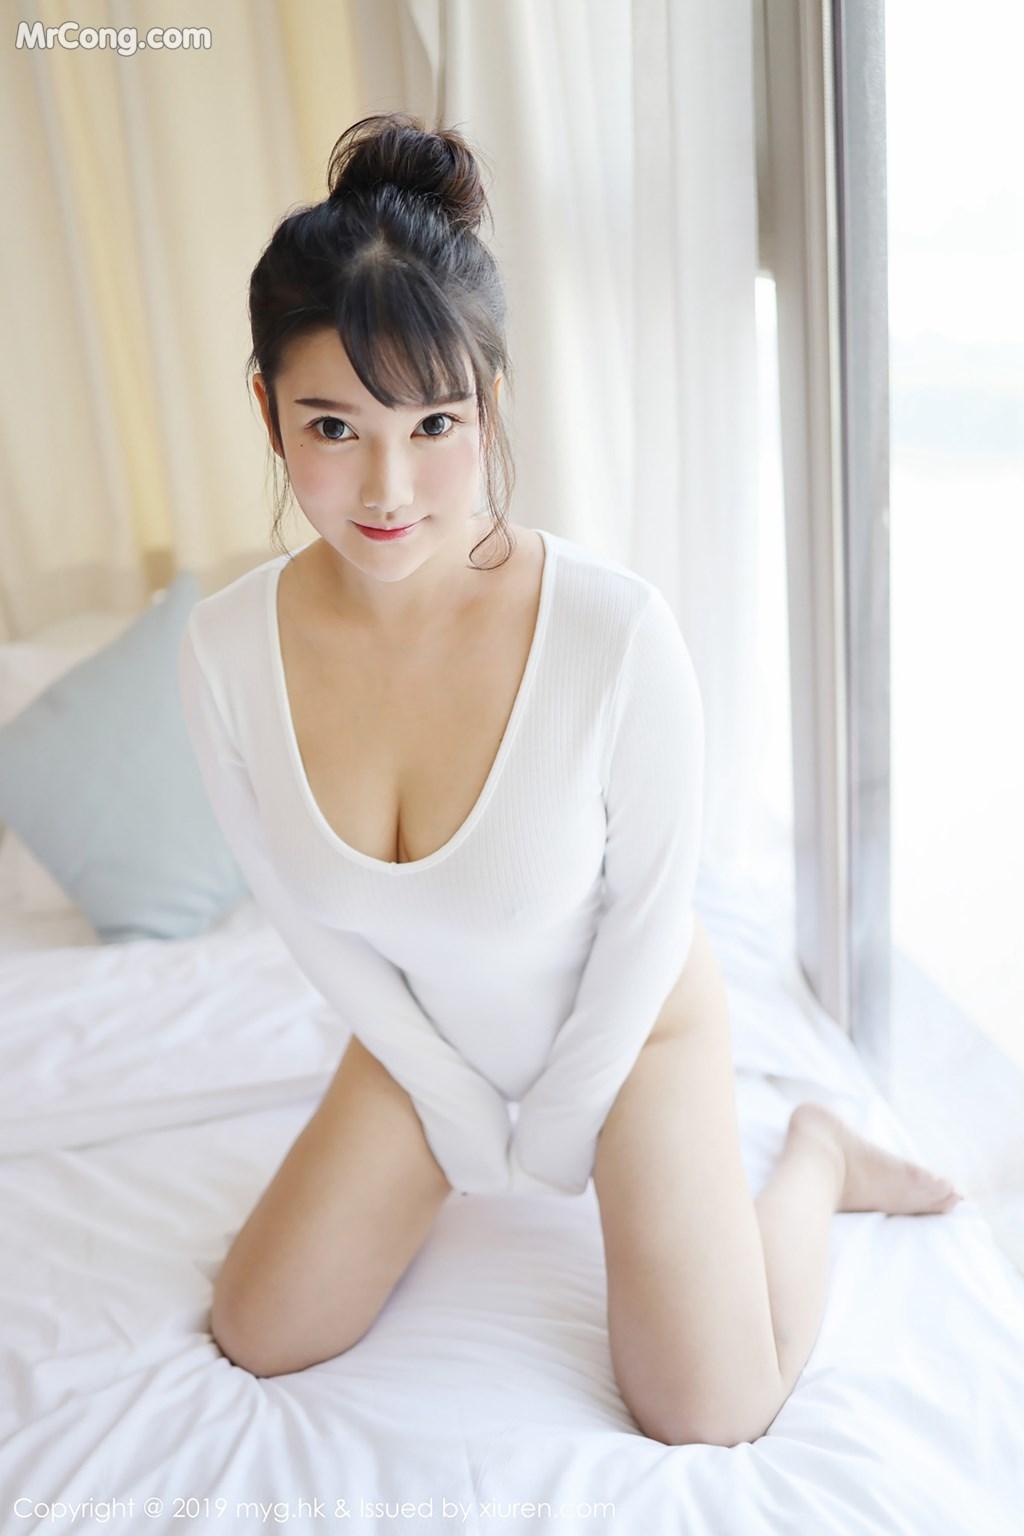 Image MyGirl-Vol.342-Xiao-You-Nai-MrCong.com-001 in post MyGirl Vol.342: Người mẫu Xiao You Nai (小尤奈) (41 ảnh)